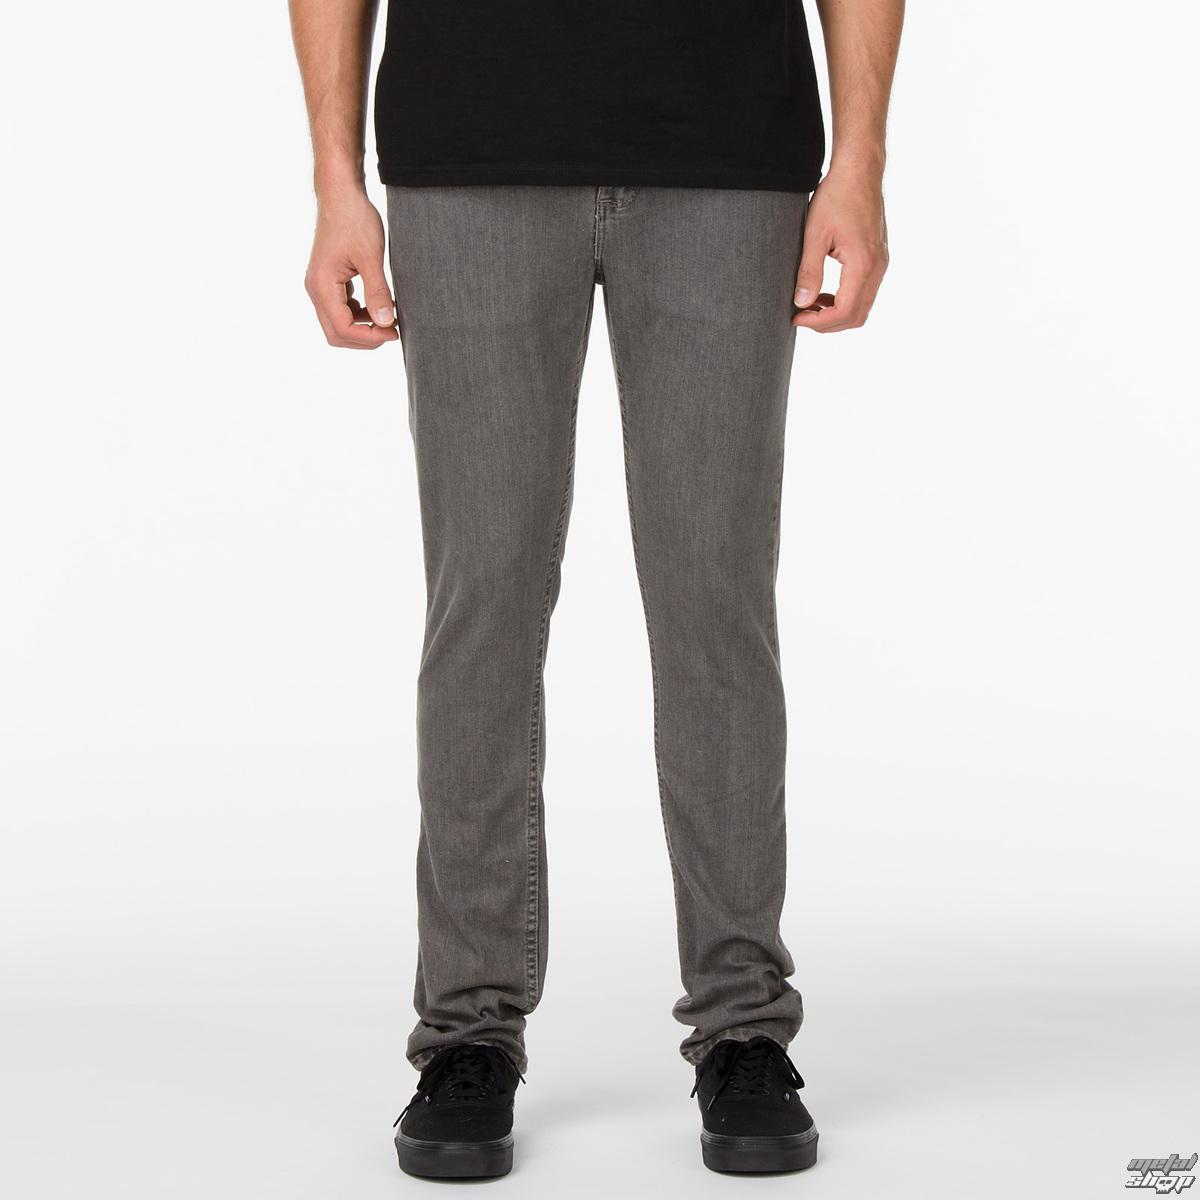 439aeae281 pants men VANS - M V76 Skinny - Gravel Grey - VK4D52V - metal-shop.eu